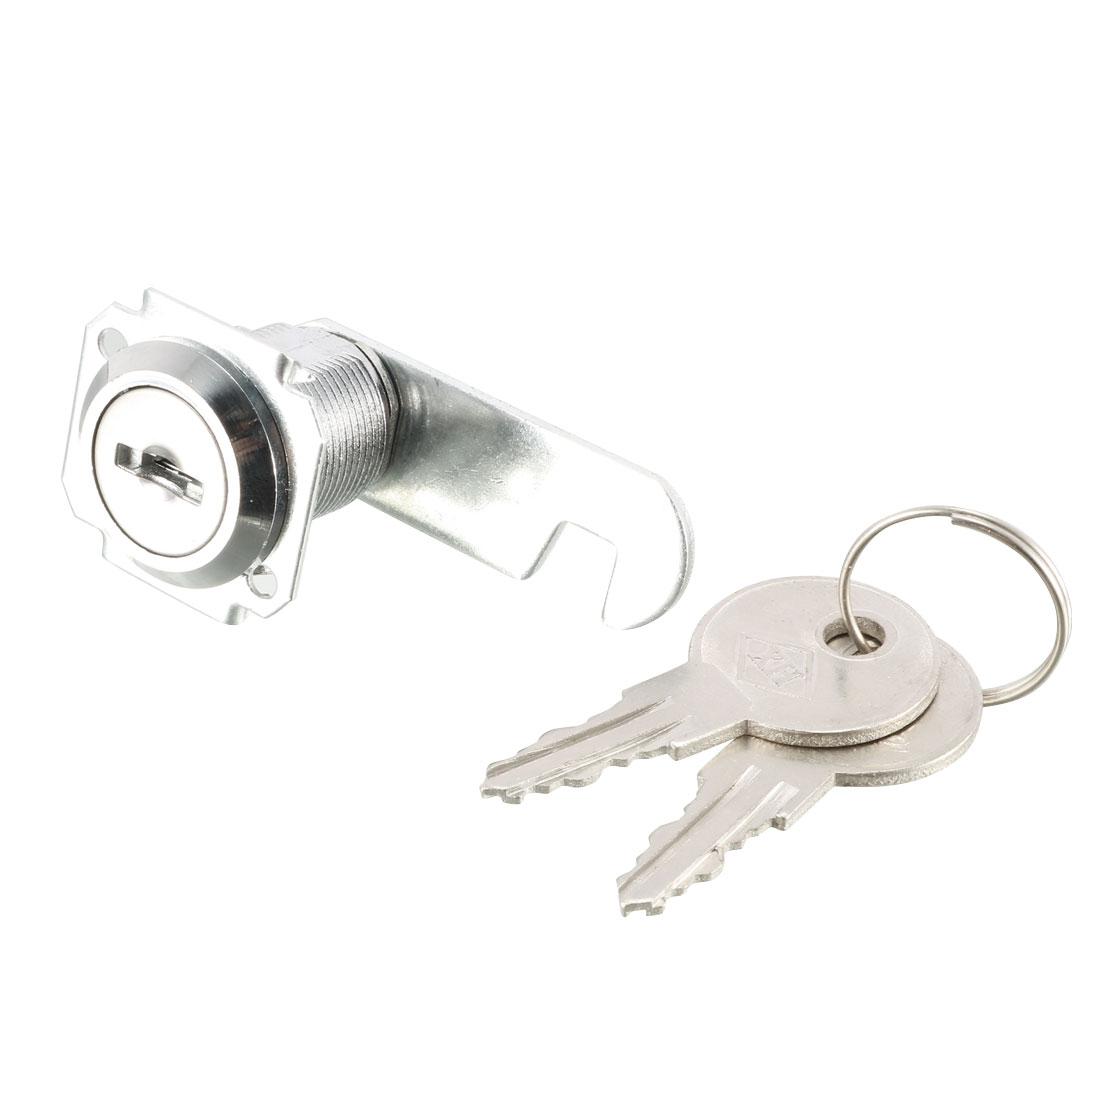 House Closet Mail Box Quarter Turn Security Metal Lock w 2 Keys